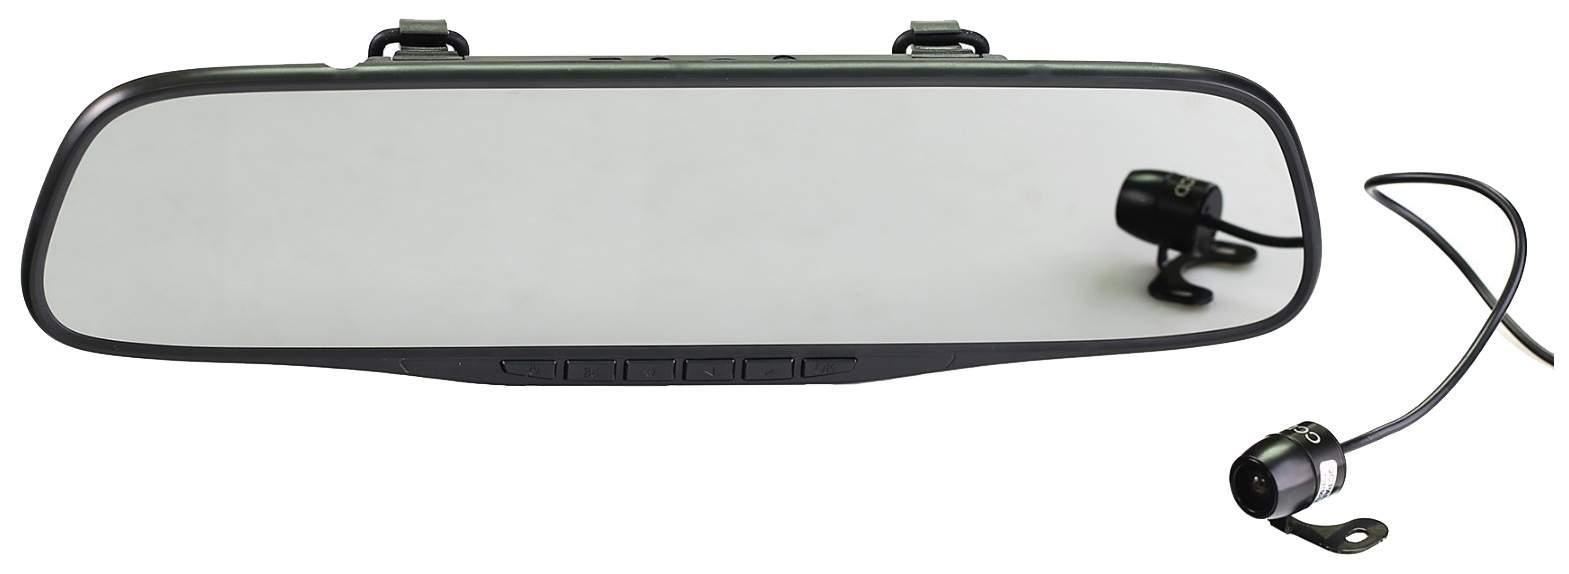 Салонное зеркало заднего вида с регистратором SilverStone NTK-351